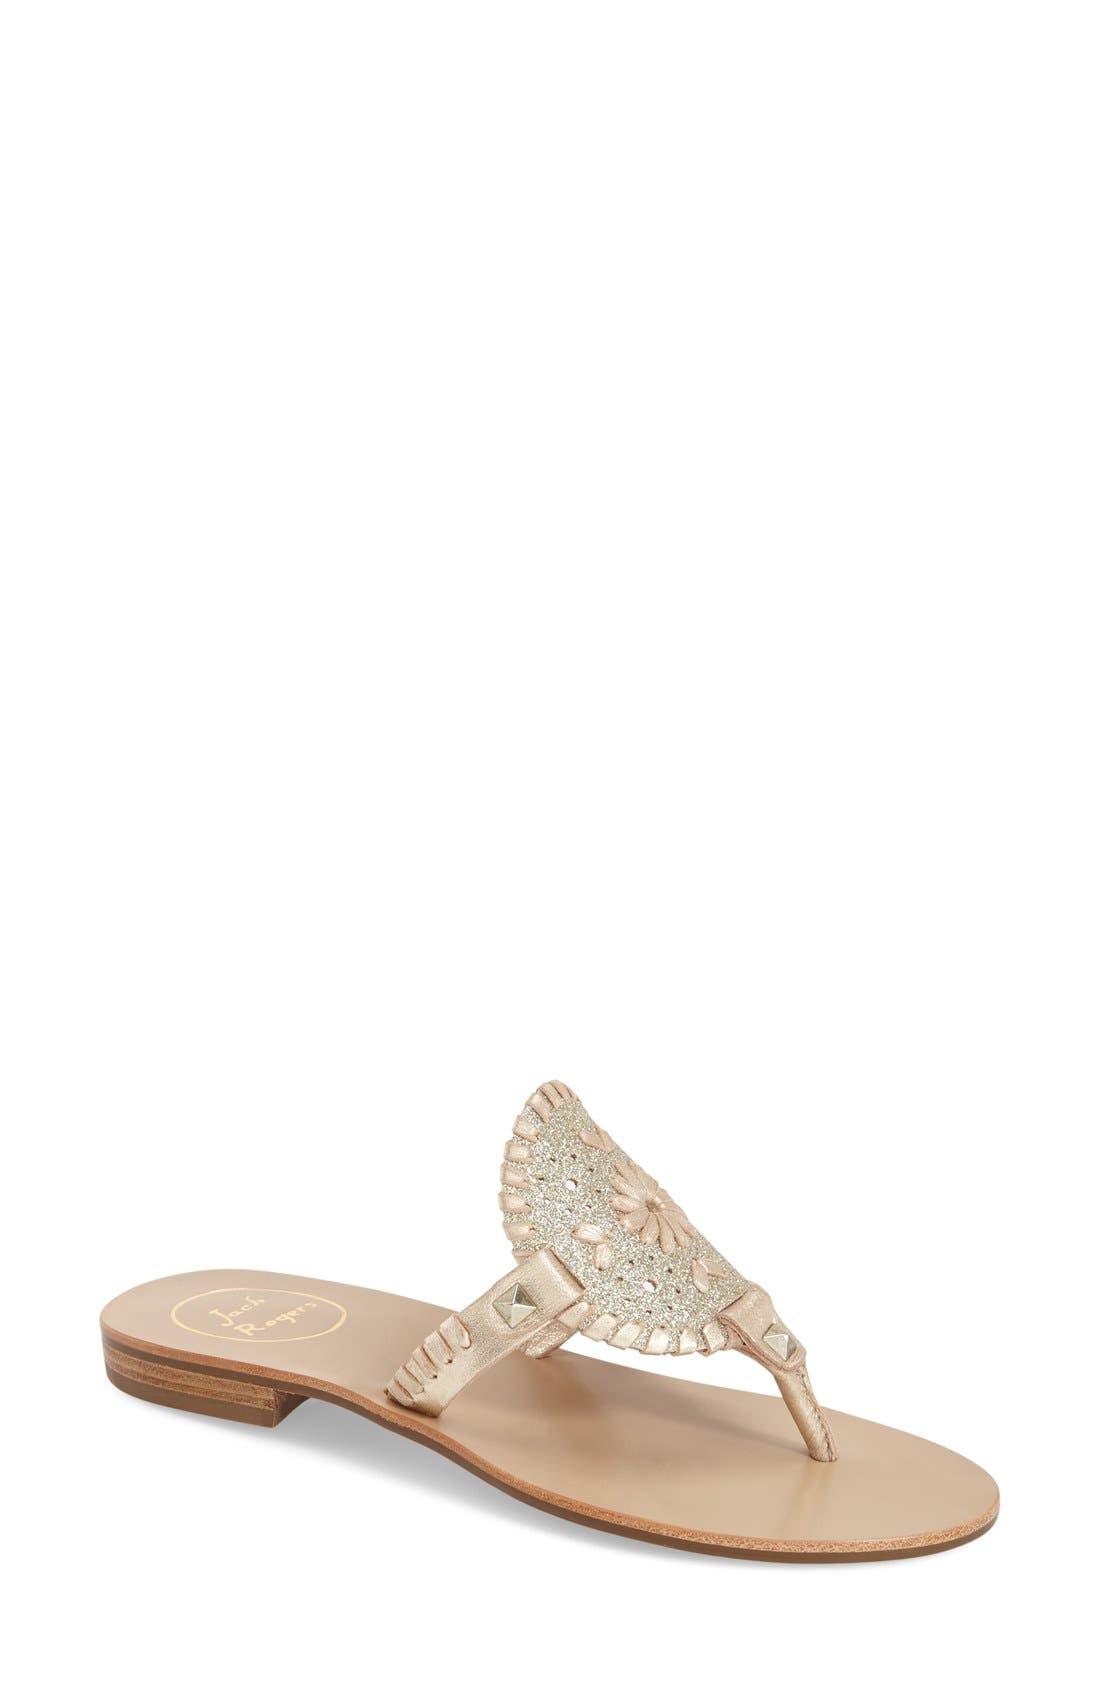 'Georgica' Sandal,                         Main,                         color, Platinum